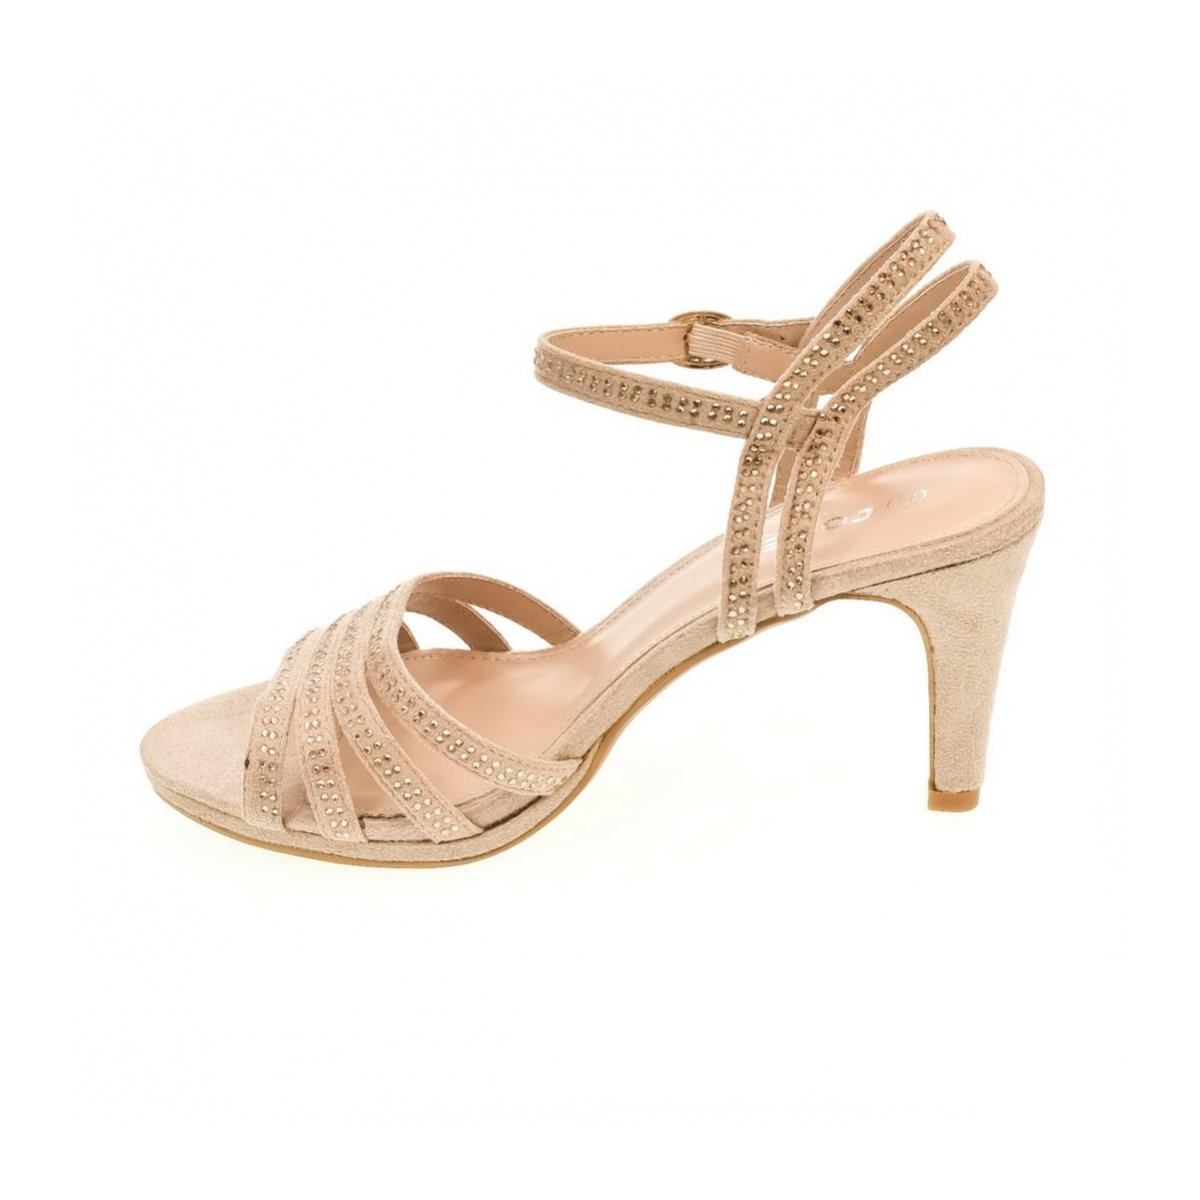 2b162a92f Dámske ružové sandále LIMA   Johnc.sk